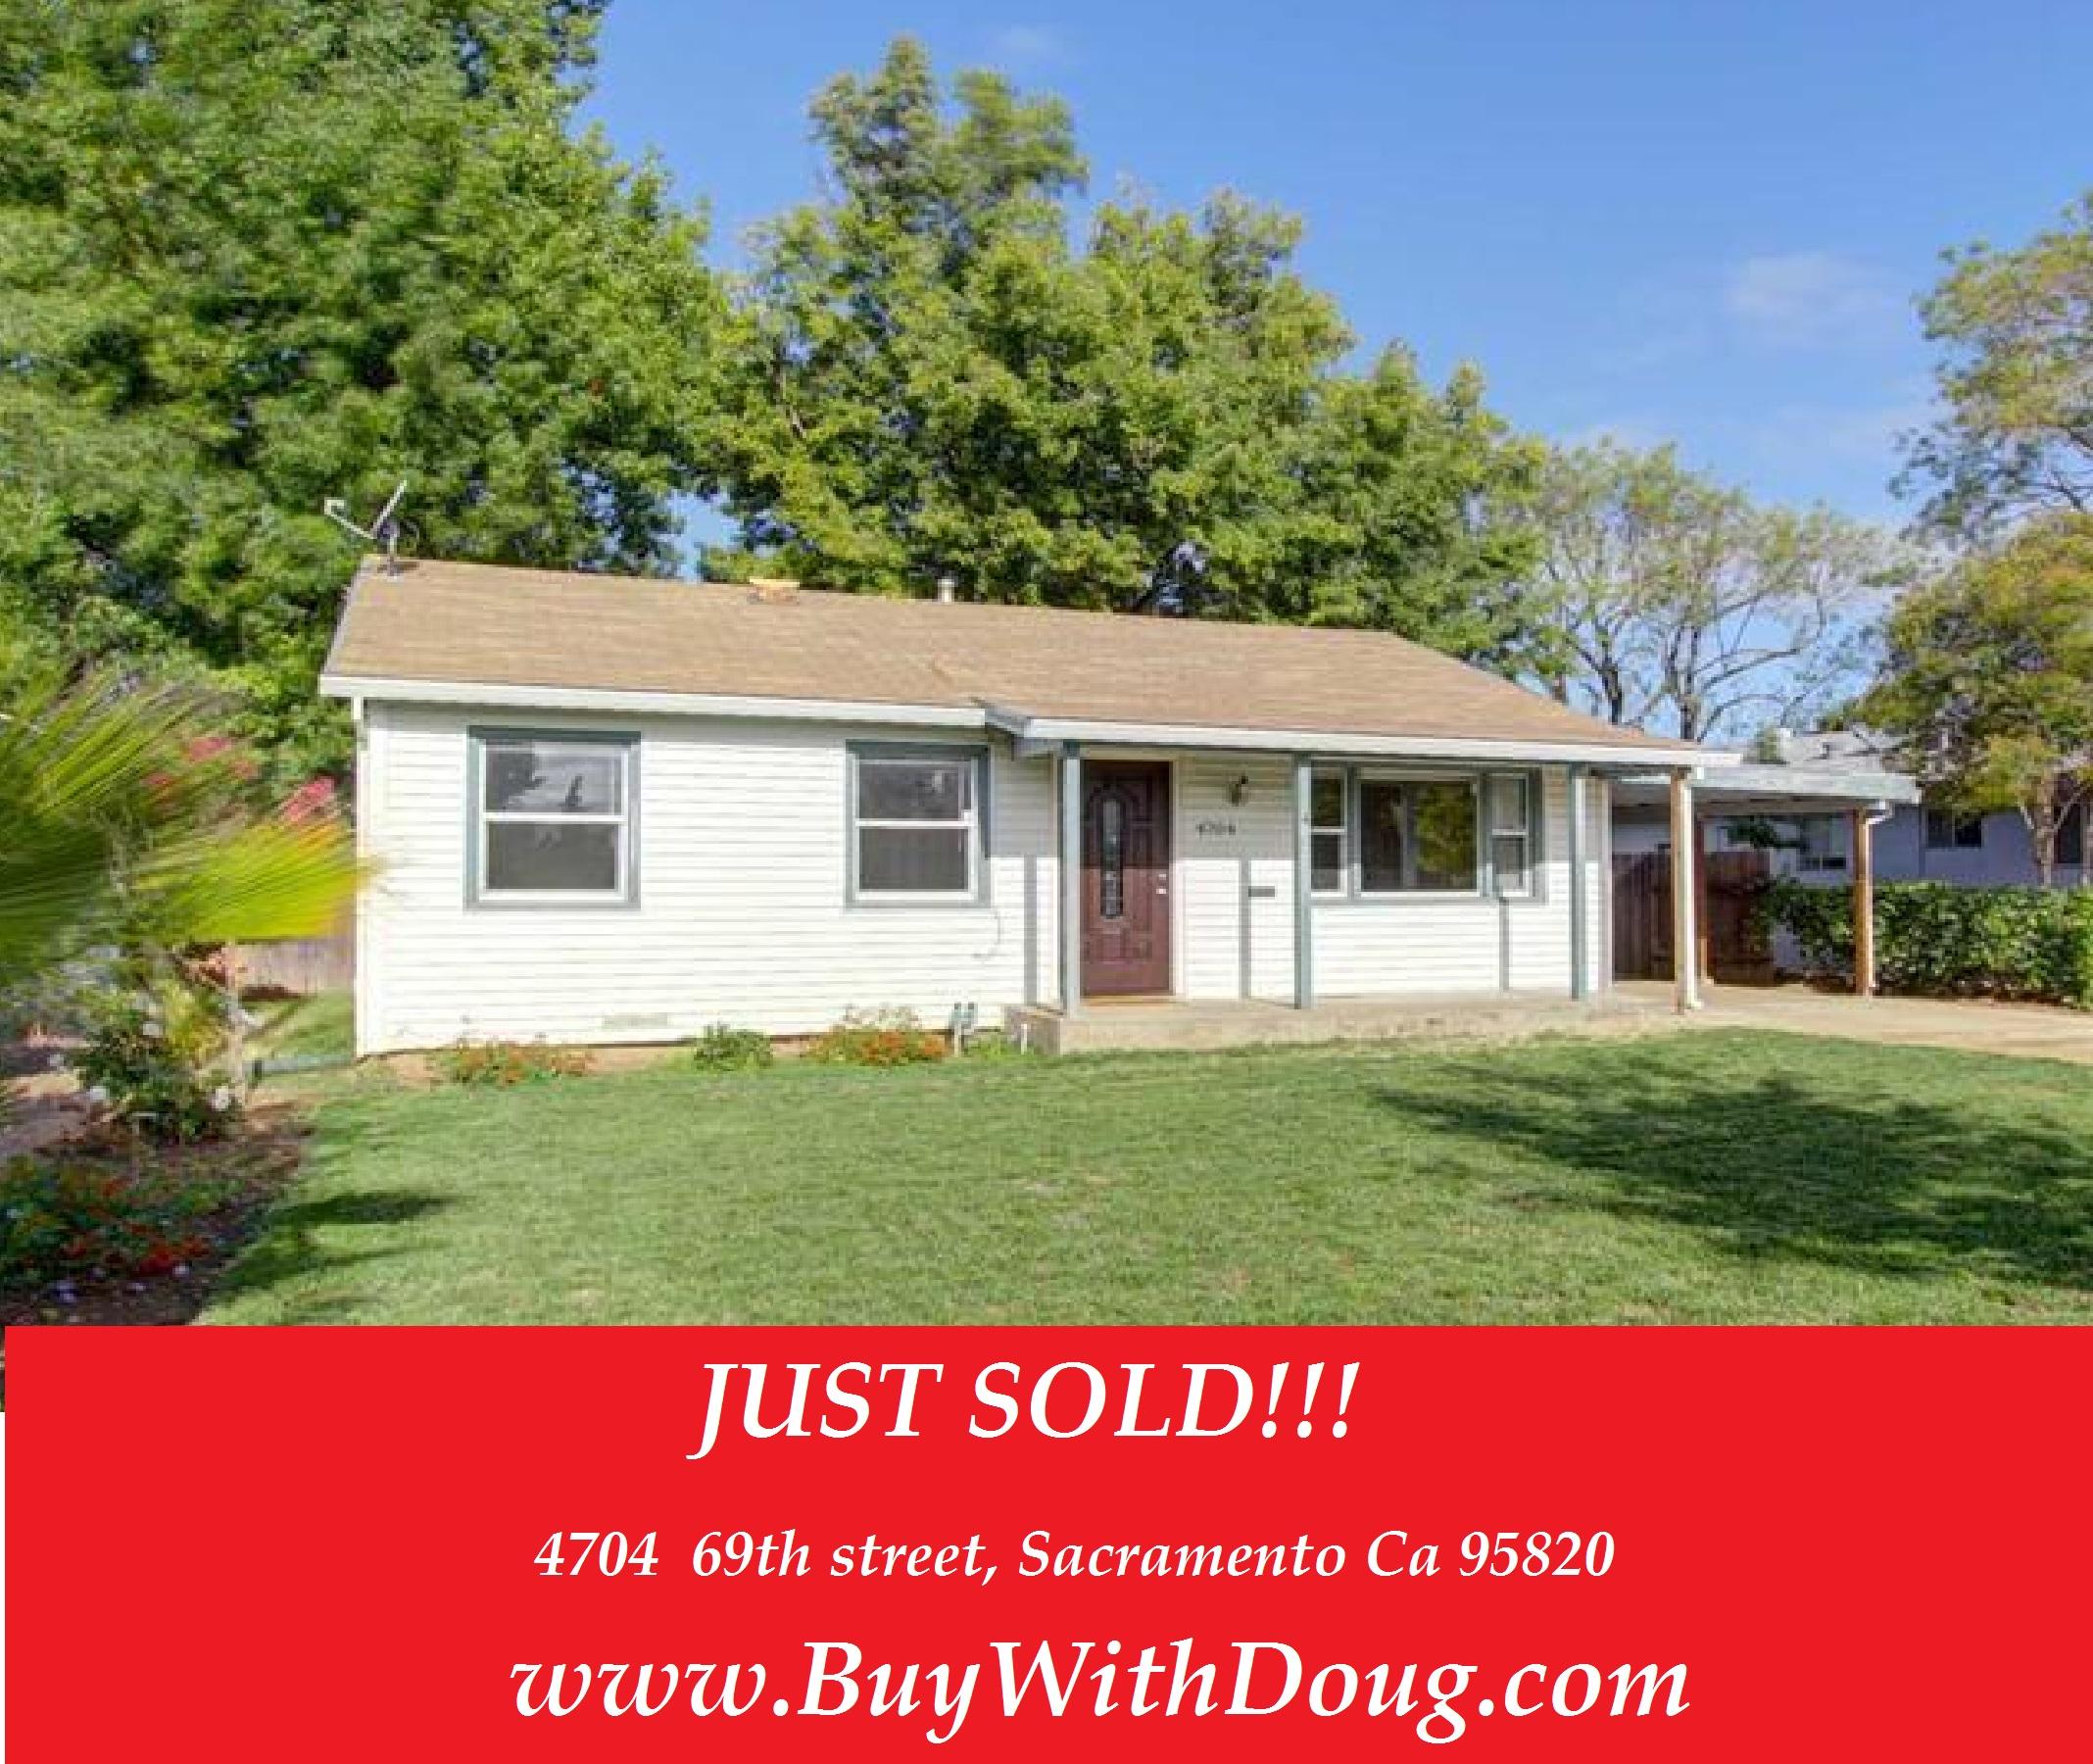 Just Sold - 4704 69th Street, Sacramento Ca 95820 - www.BuyWithDoug.com - Doug Reynolds Real Estate - Sacramento Realtor